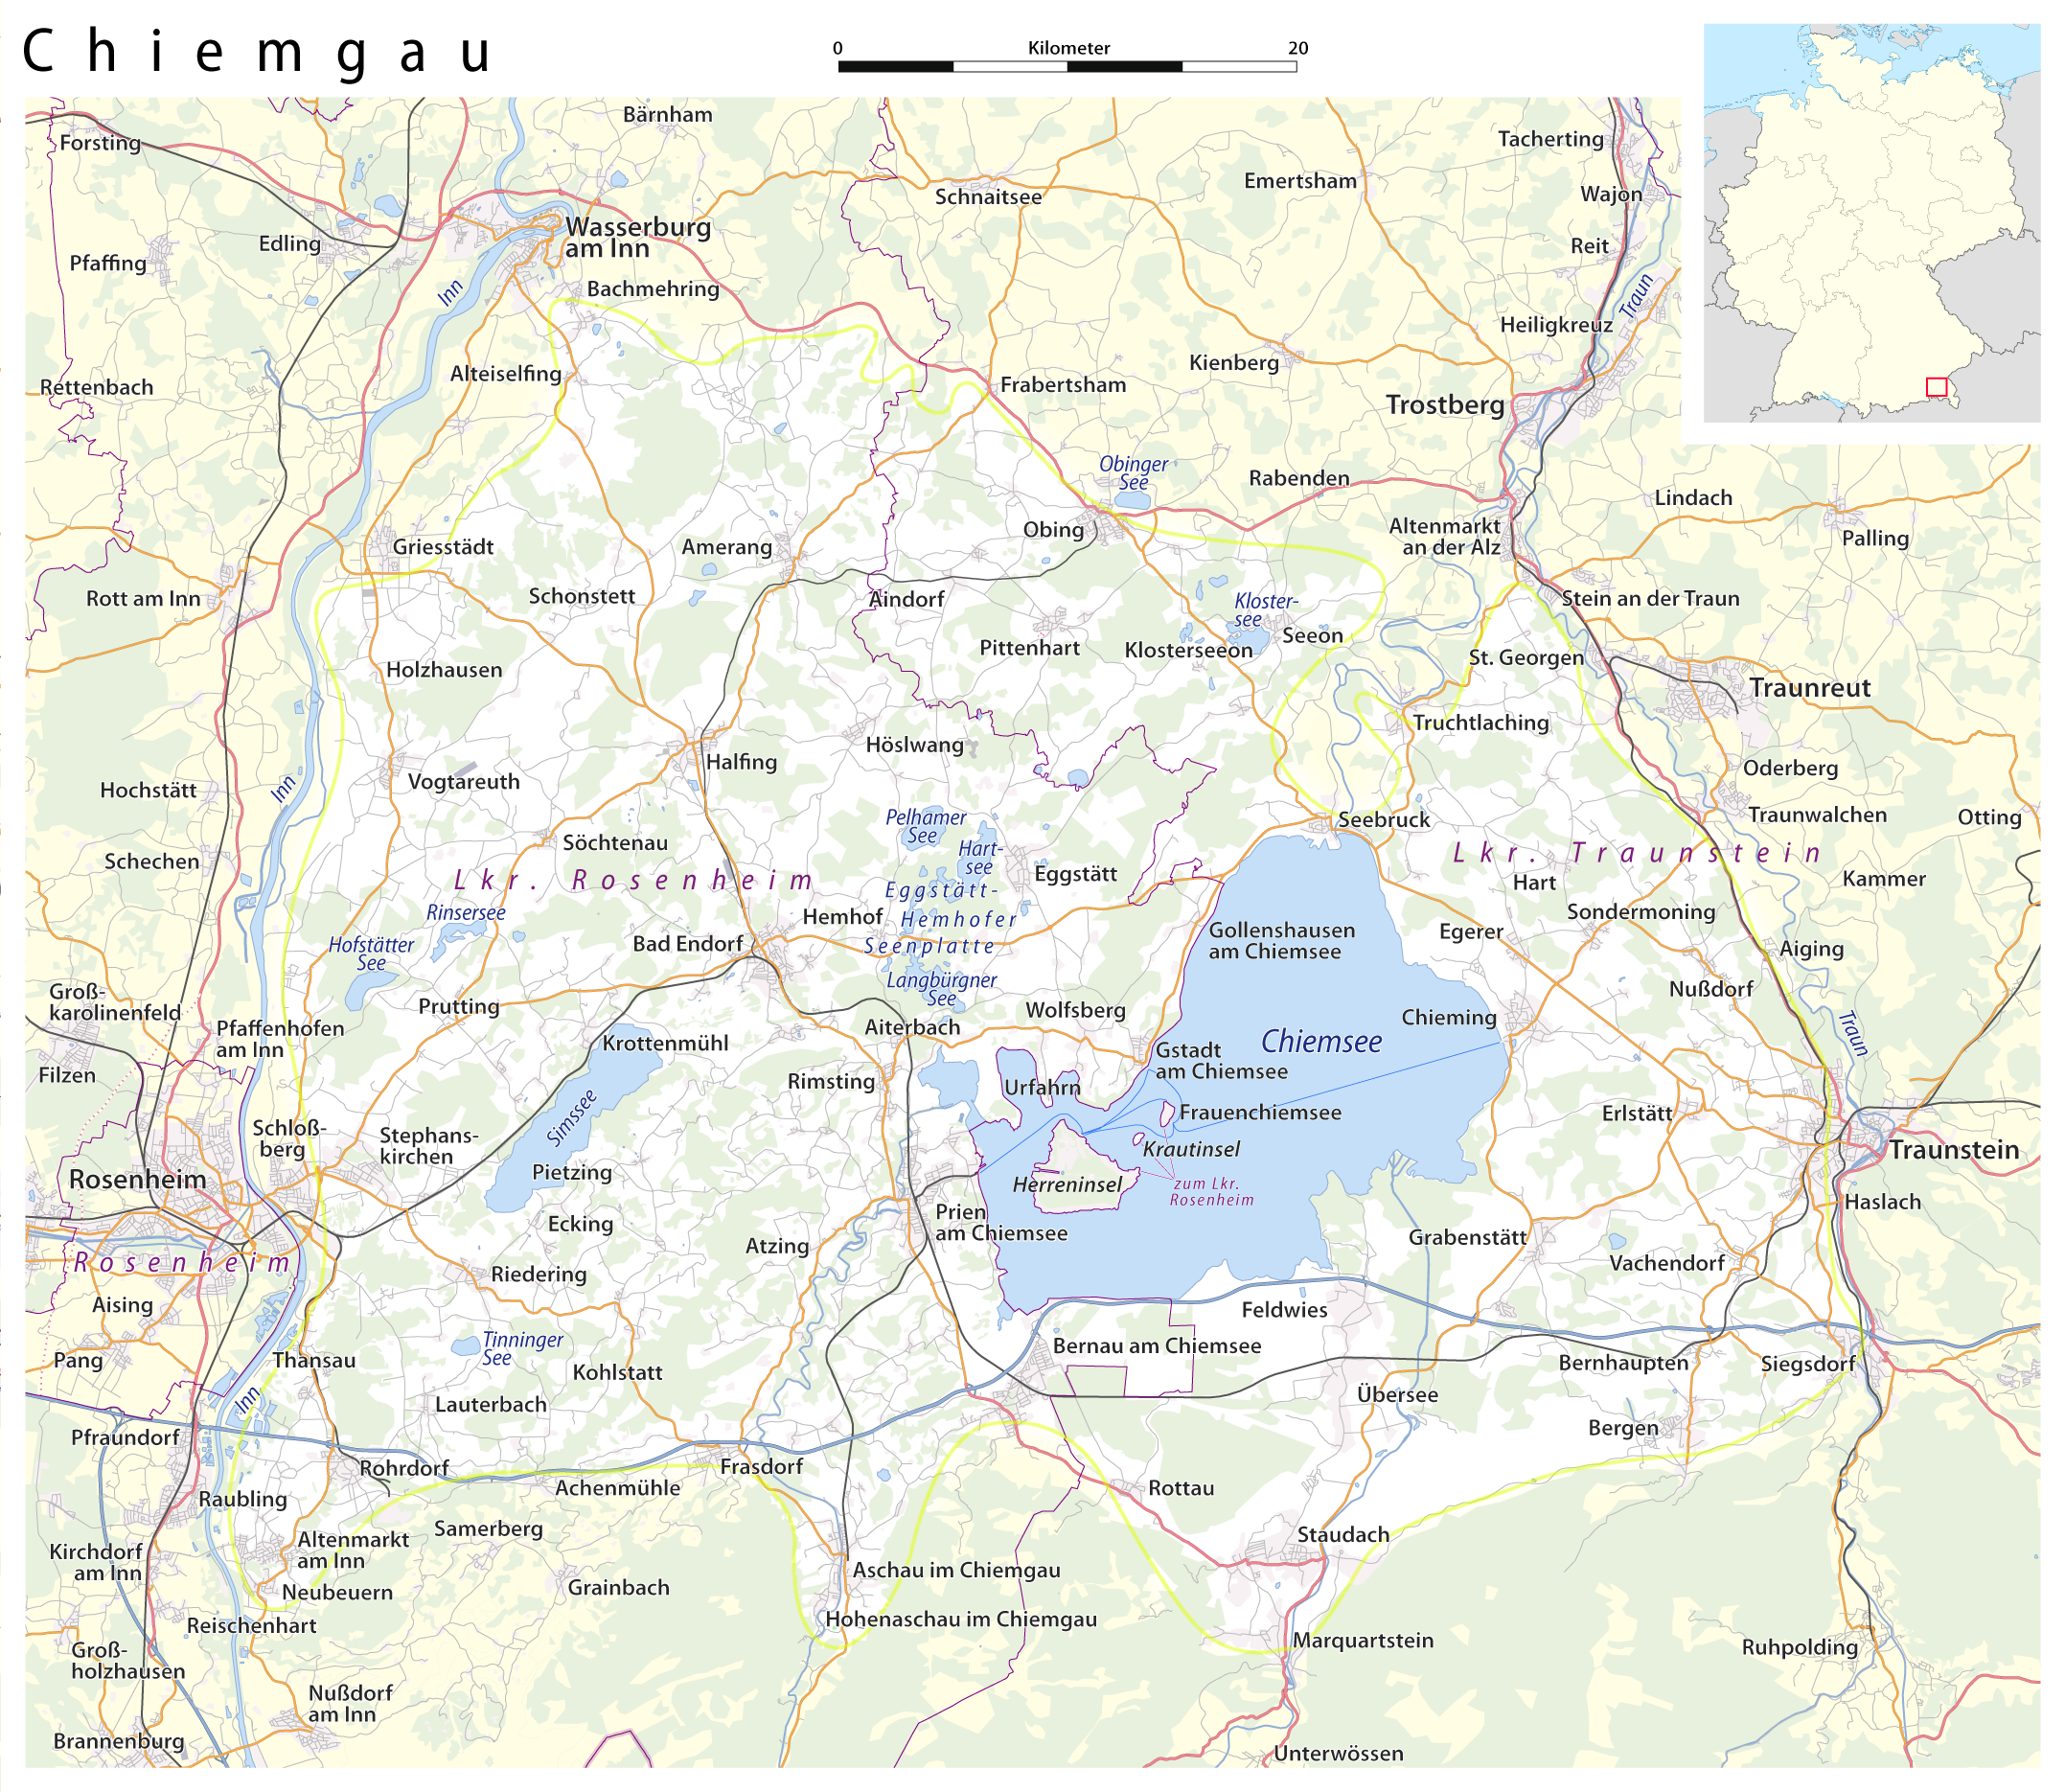 Chiemsee Karte.Datei Karte Chiemgau Png Wikipedia